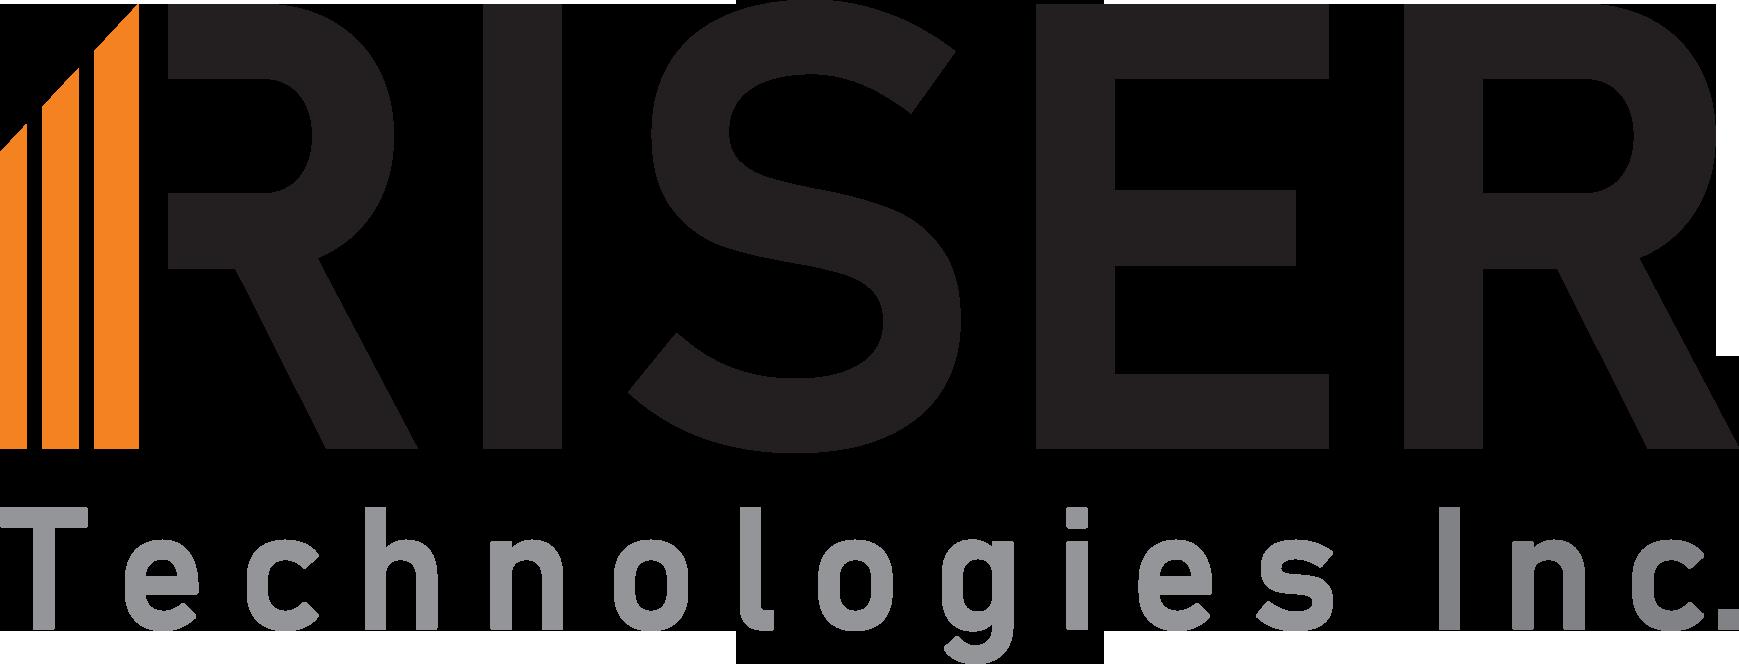 Riser Technologies